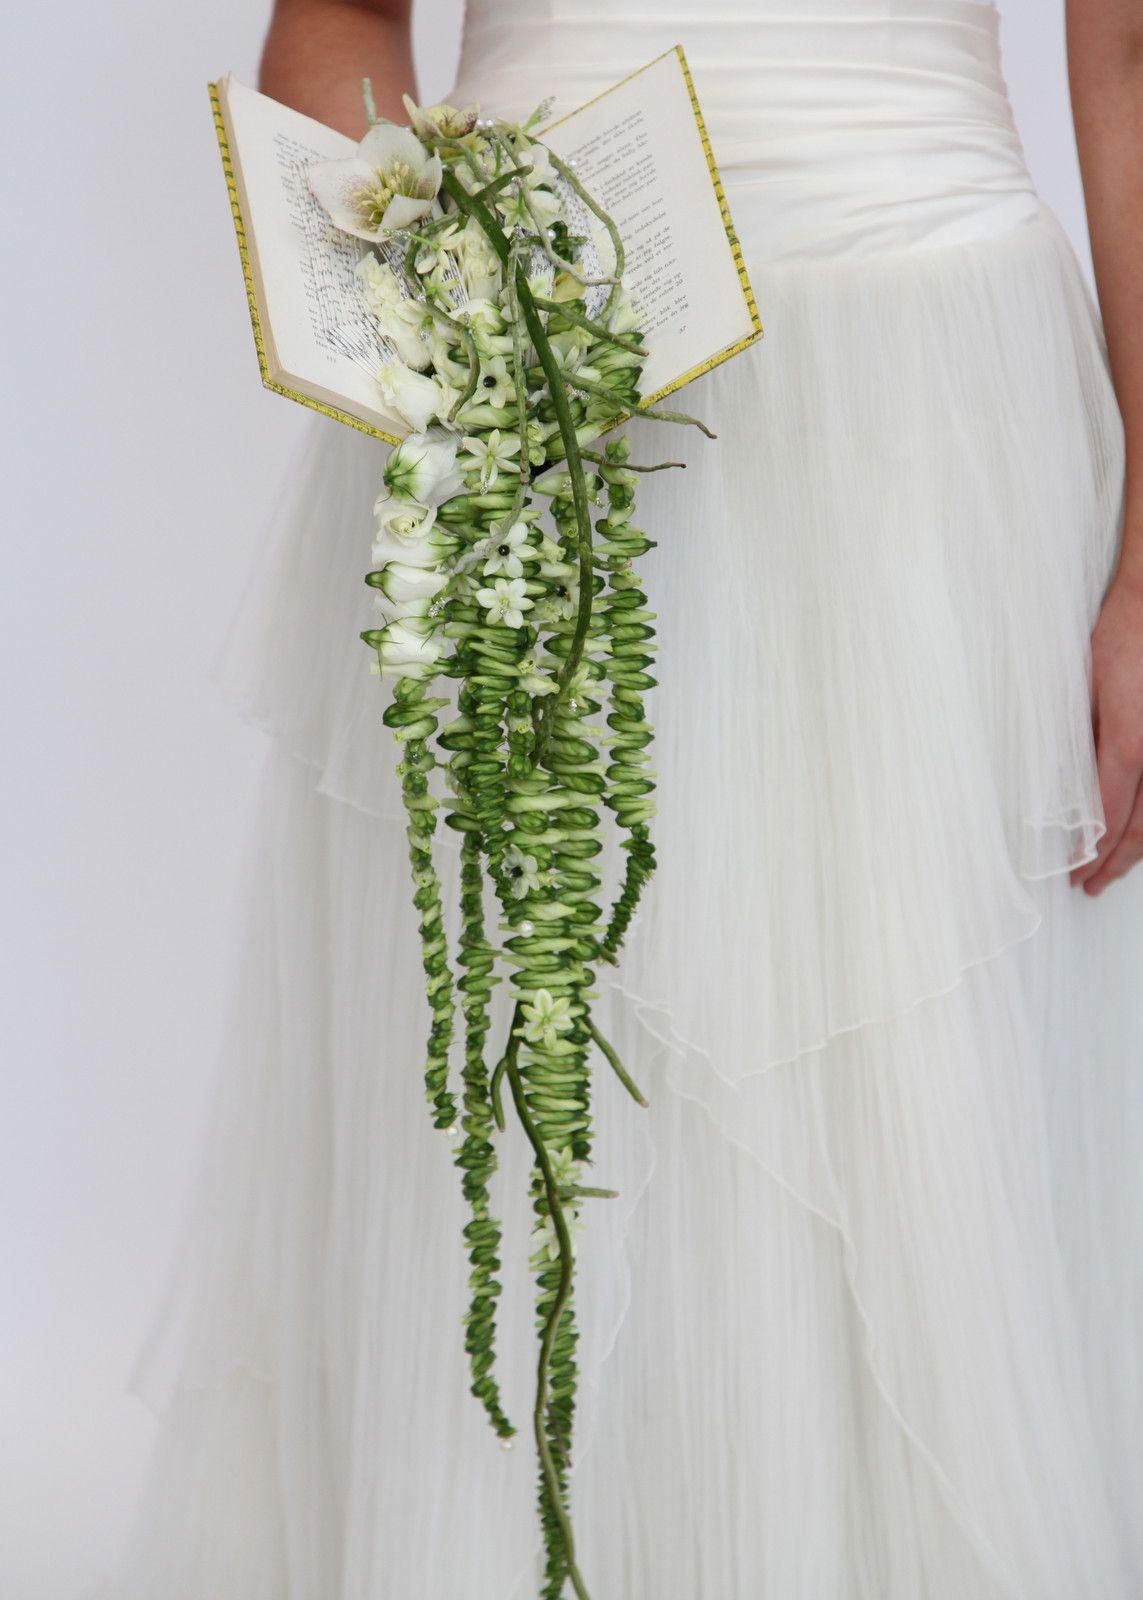 Åh den va kul, den här buketten gör mig nyfiken.......Danish florist Annette von Einem